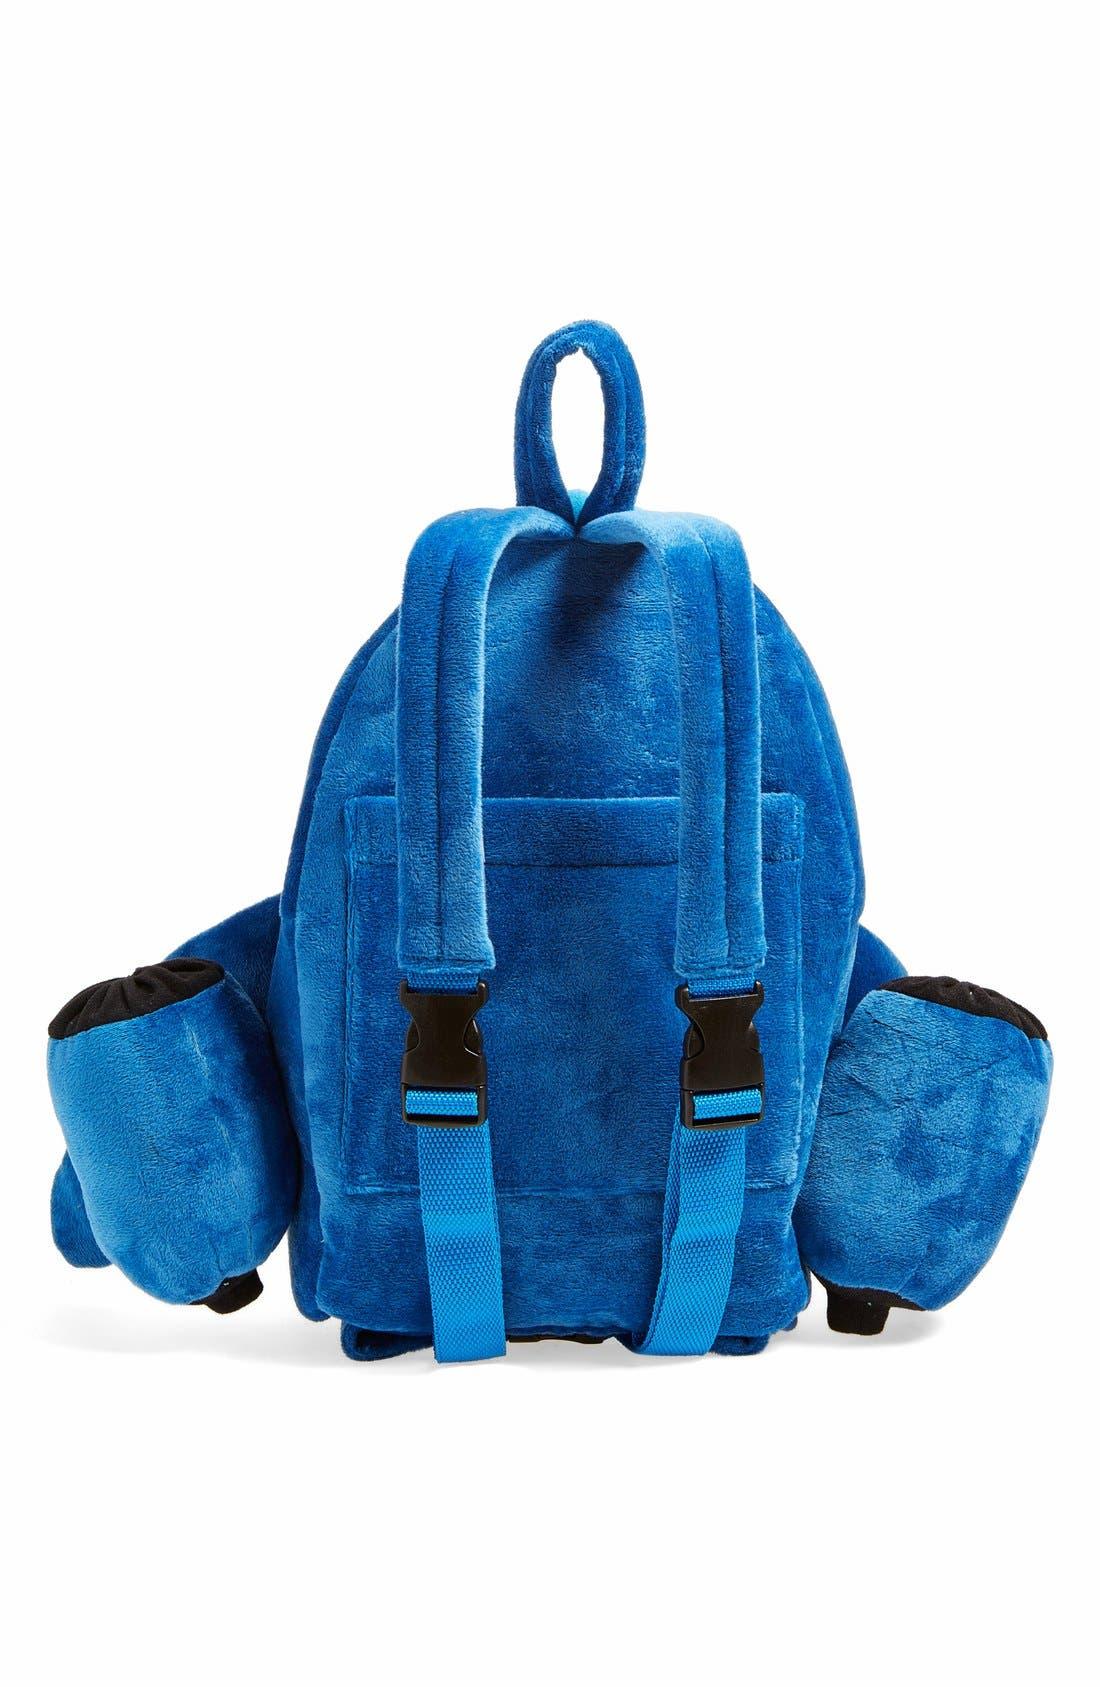 Trolley Rolling Backpack Set,                             Alternate thumbnail 30, color,